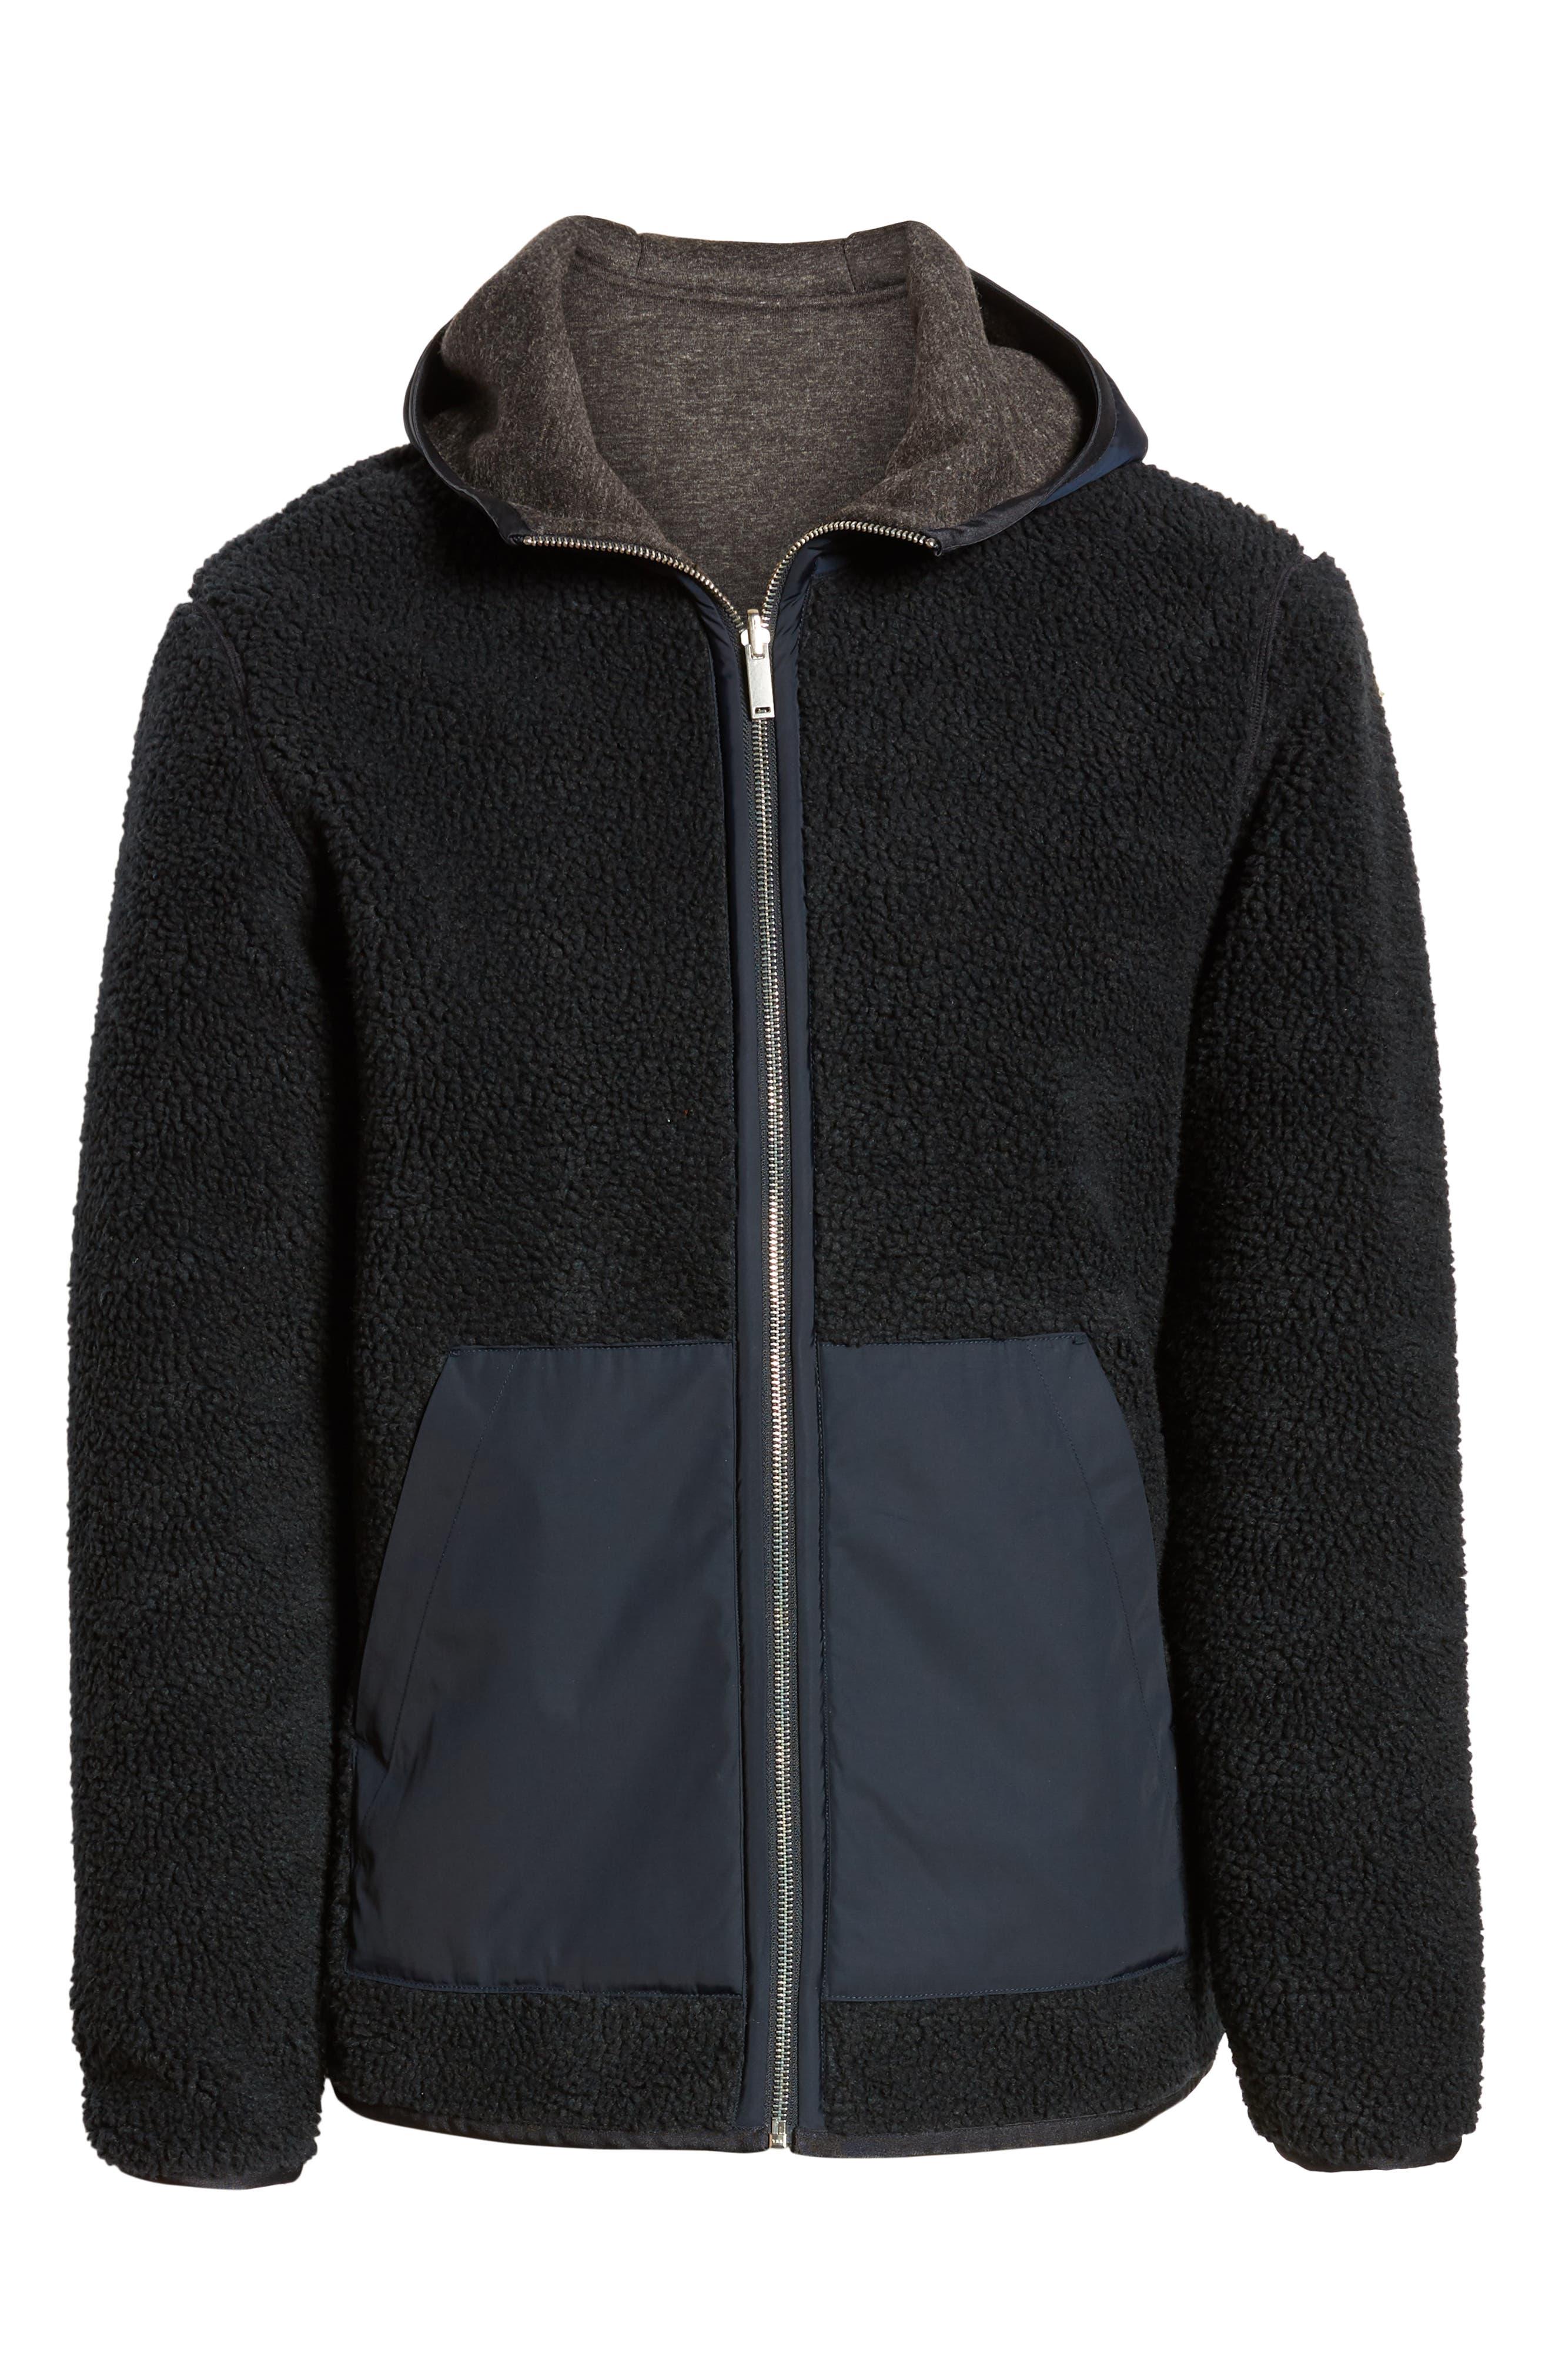 THEORY, Polar Fleece Reversible Zip Hoodie, Alternate thumbnail 8, color, 476